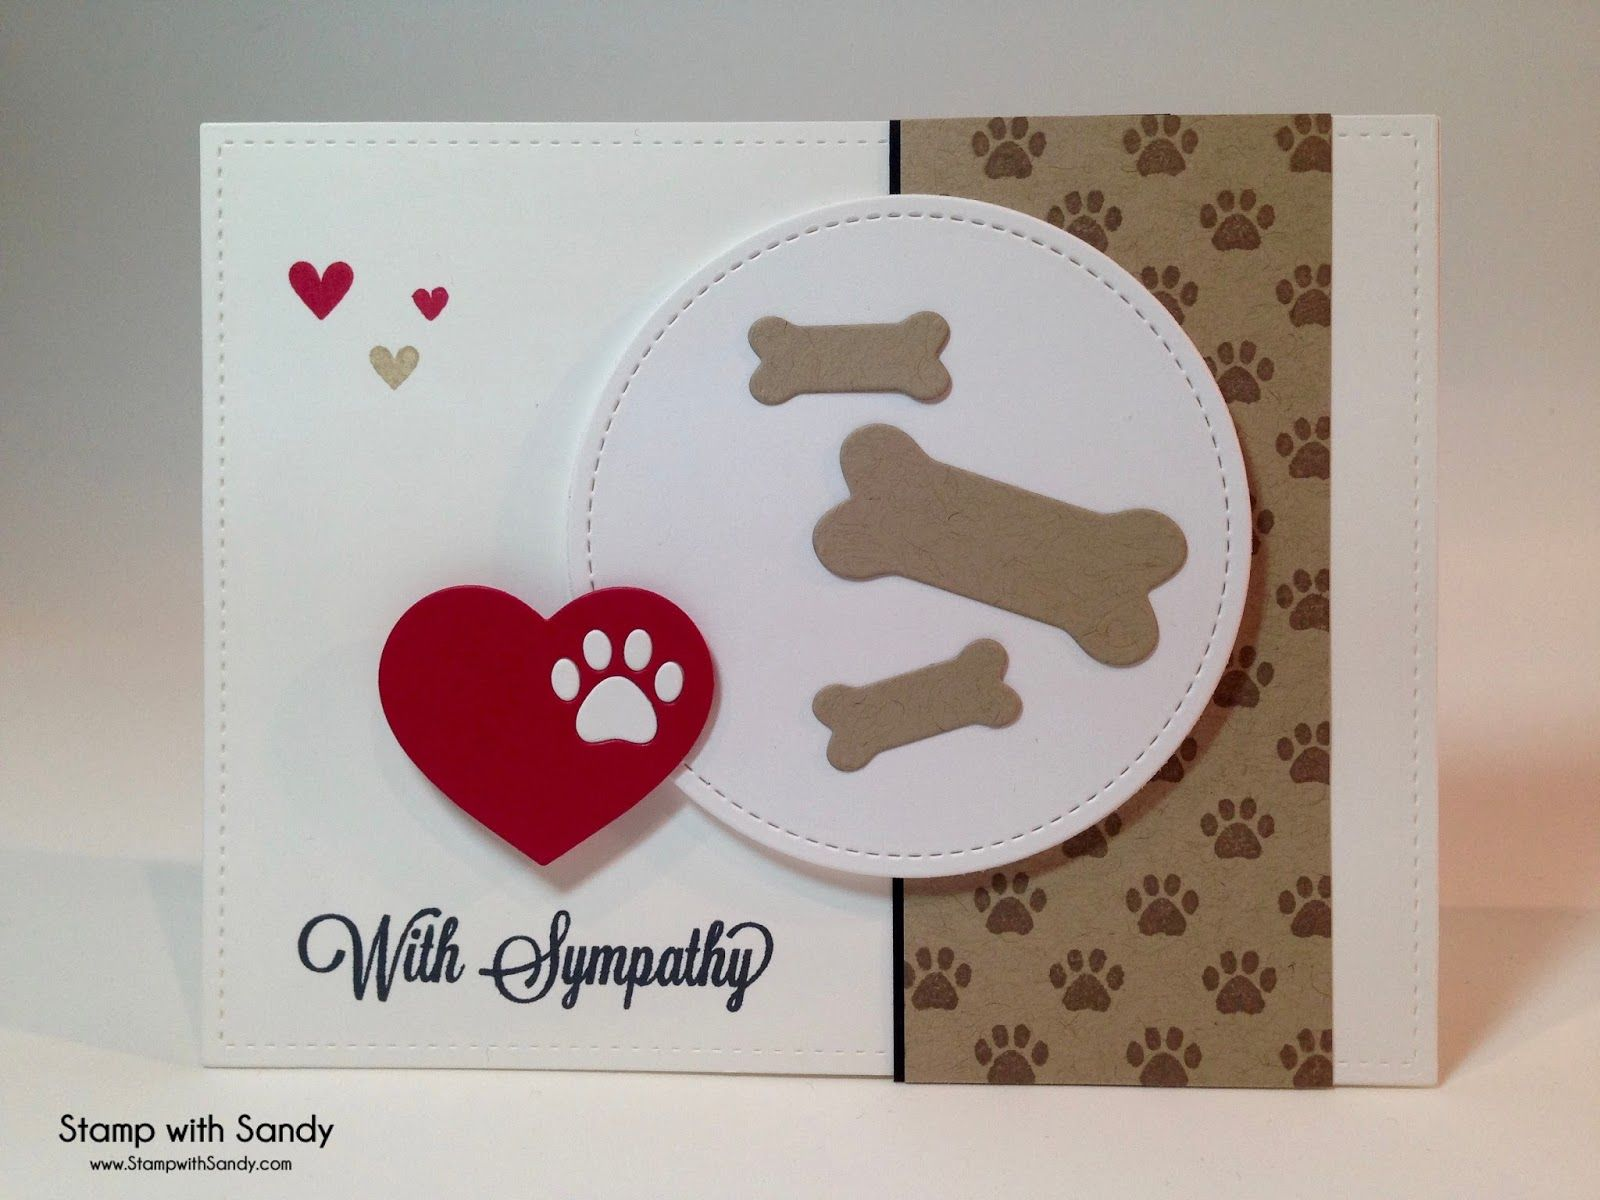 Peachy Se Pet Sympathy Pet Sympathy Cards A Made Quite A Few Dog Cards Pet Sympathy Cards Printable Free Pet Sympathy Cards Bulk A Sad Loss I Have A Card Today To Share cards Pet Sympathy Cards